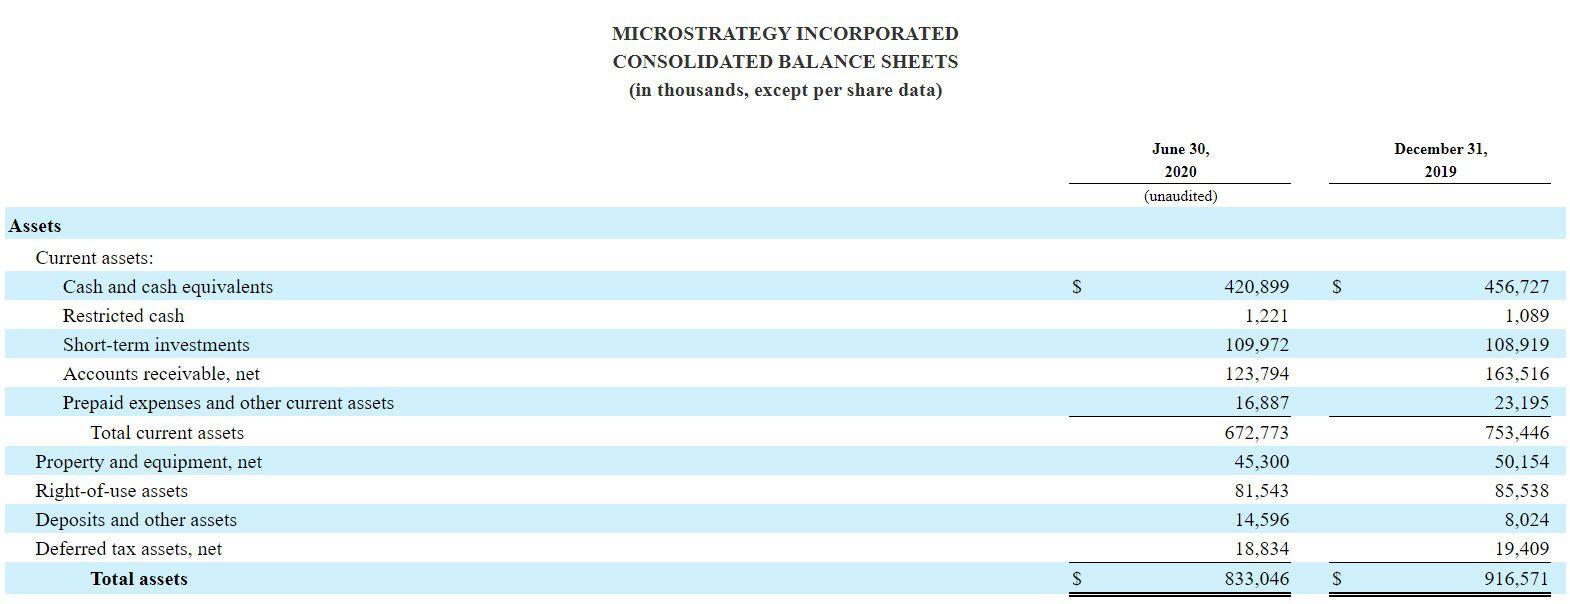 microstrategy balance sheets